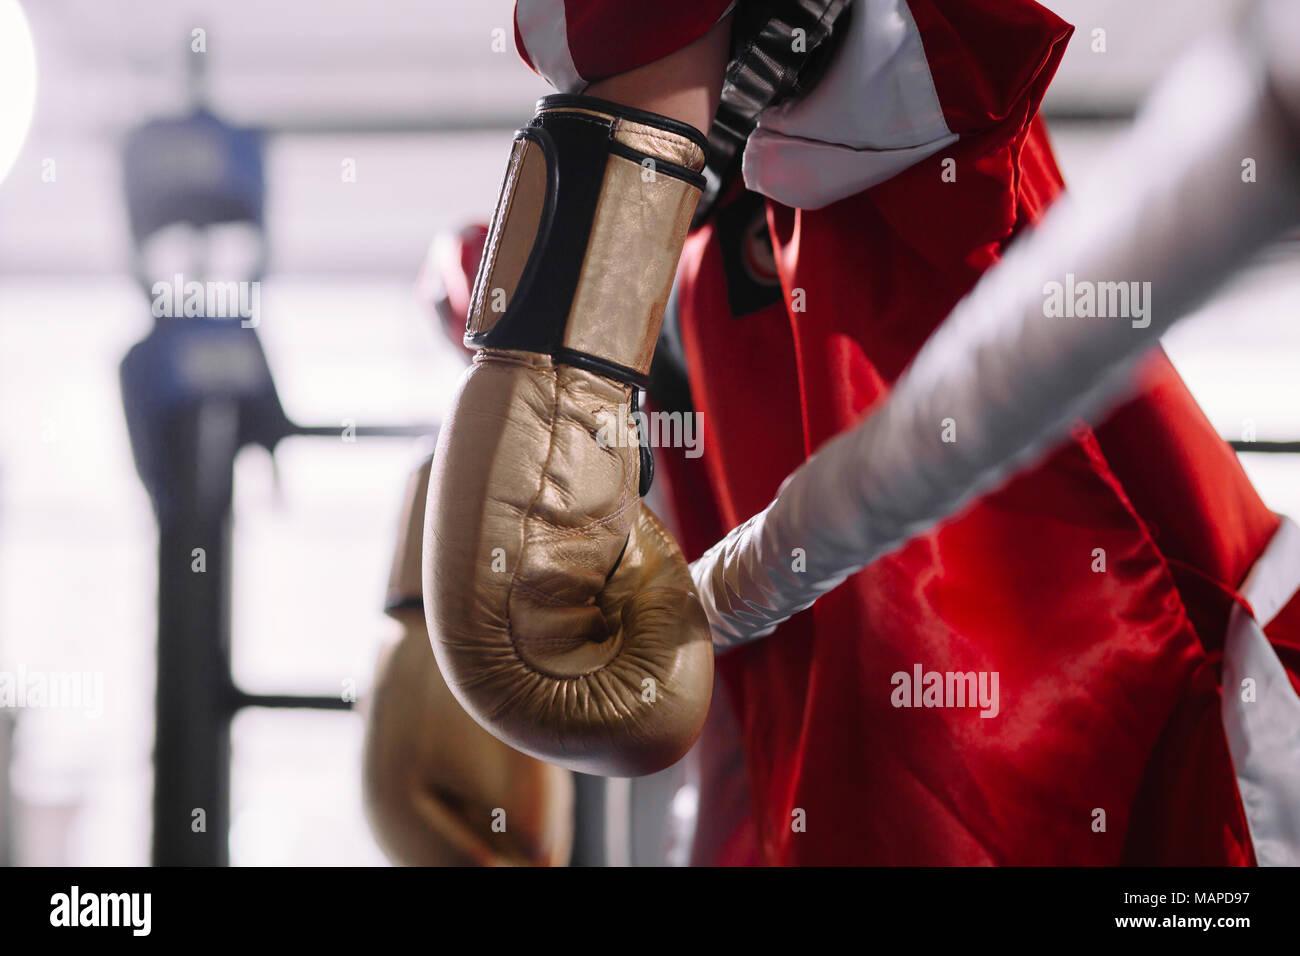 Golpeado boxeador en amarillo Guantes boxeo inclinándose sobre cuerdas Imagen De Stock